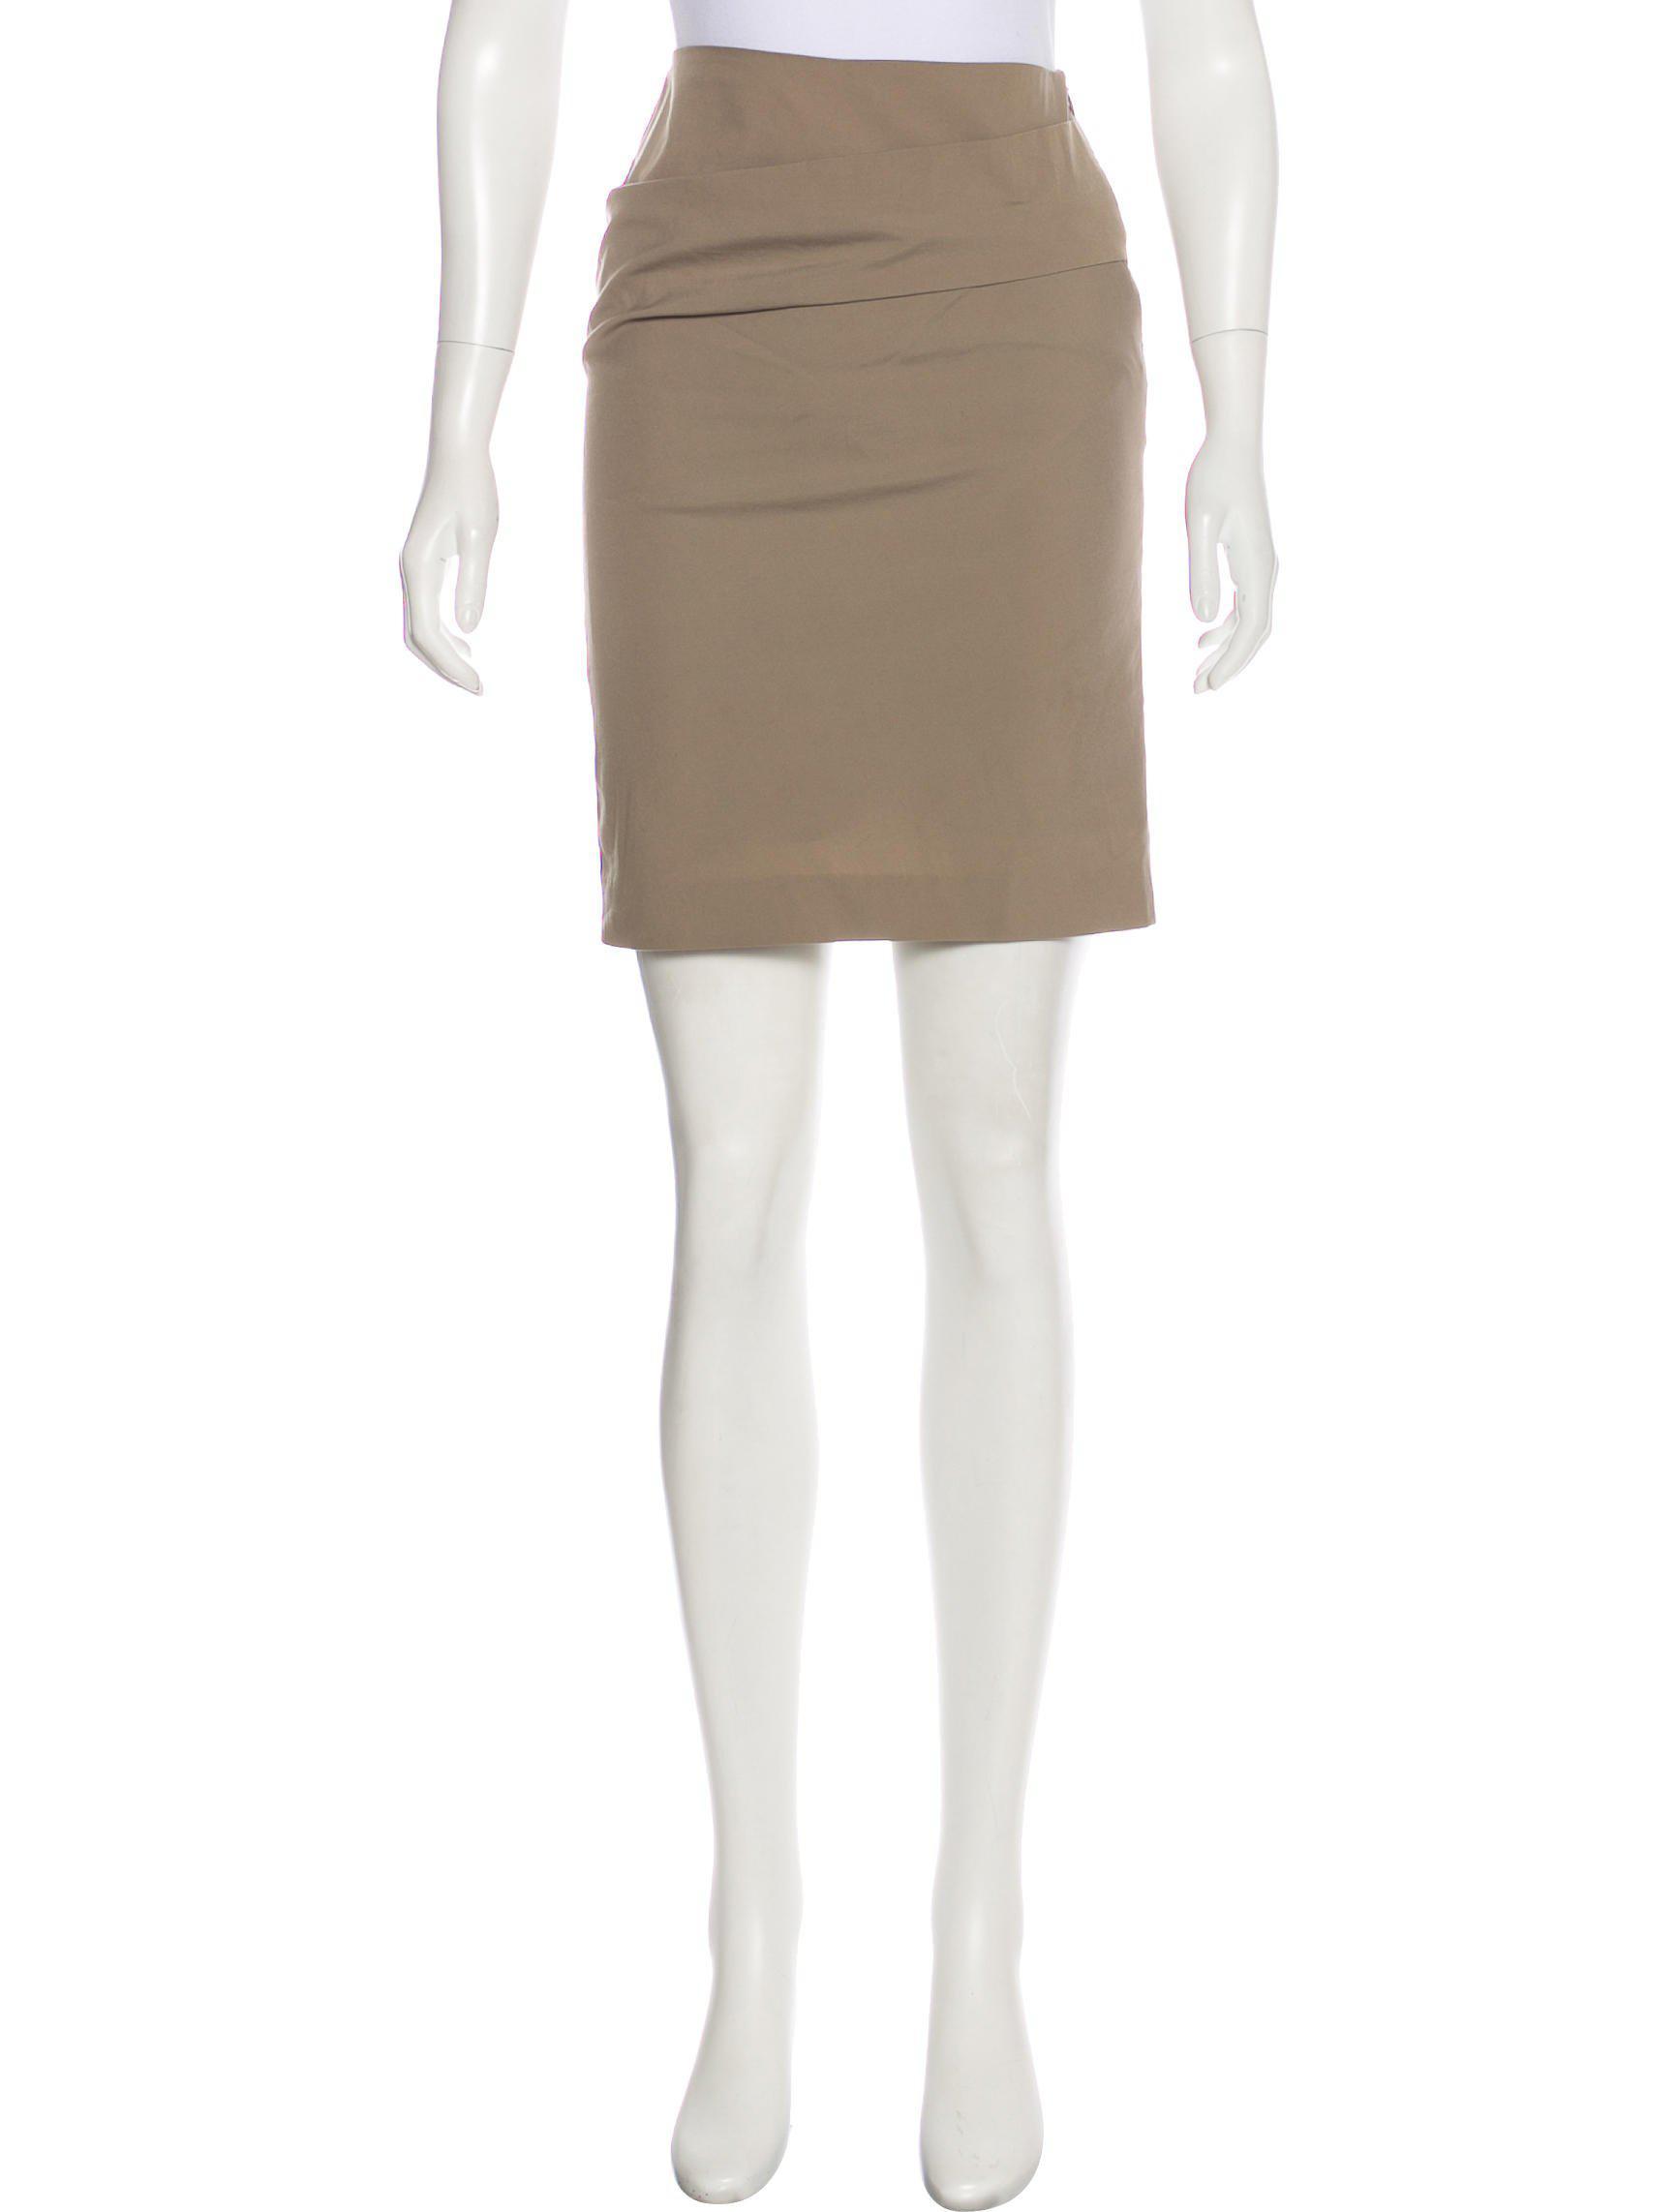 19b3265f4 Lyst - Brunello Cucinelli Mini Pencil Skirt Khaki in Natural